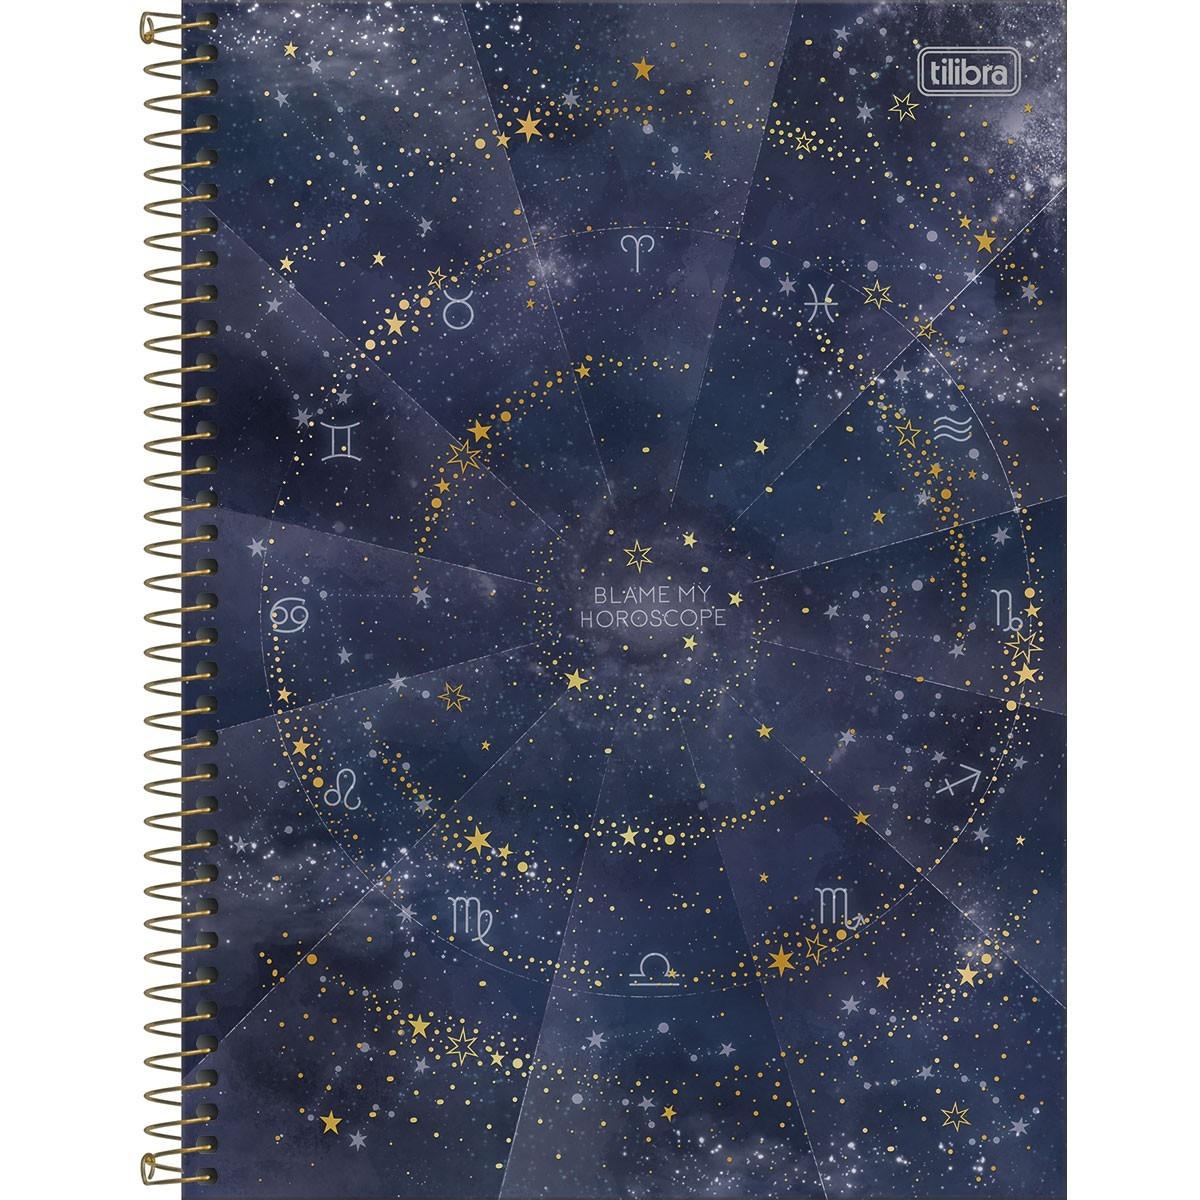 Caderno Espiral Capa Dura Colegial 10 Matérias Magic Blame 160 Folhas